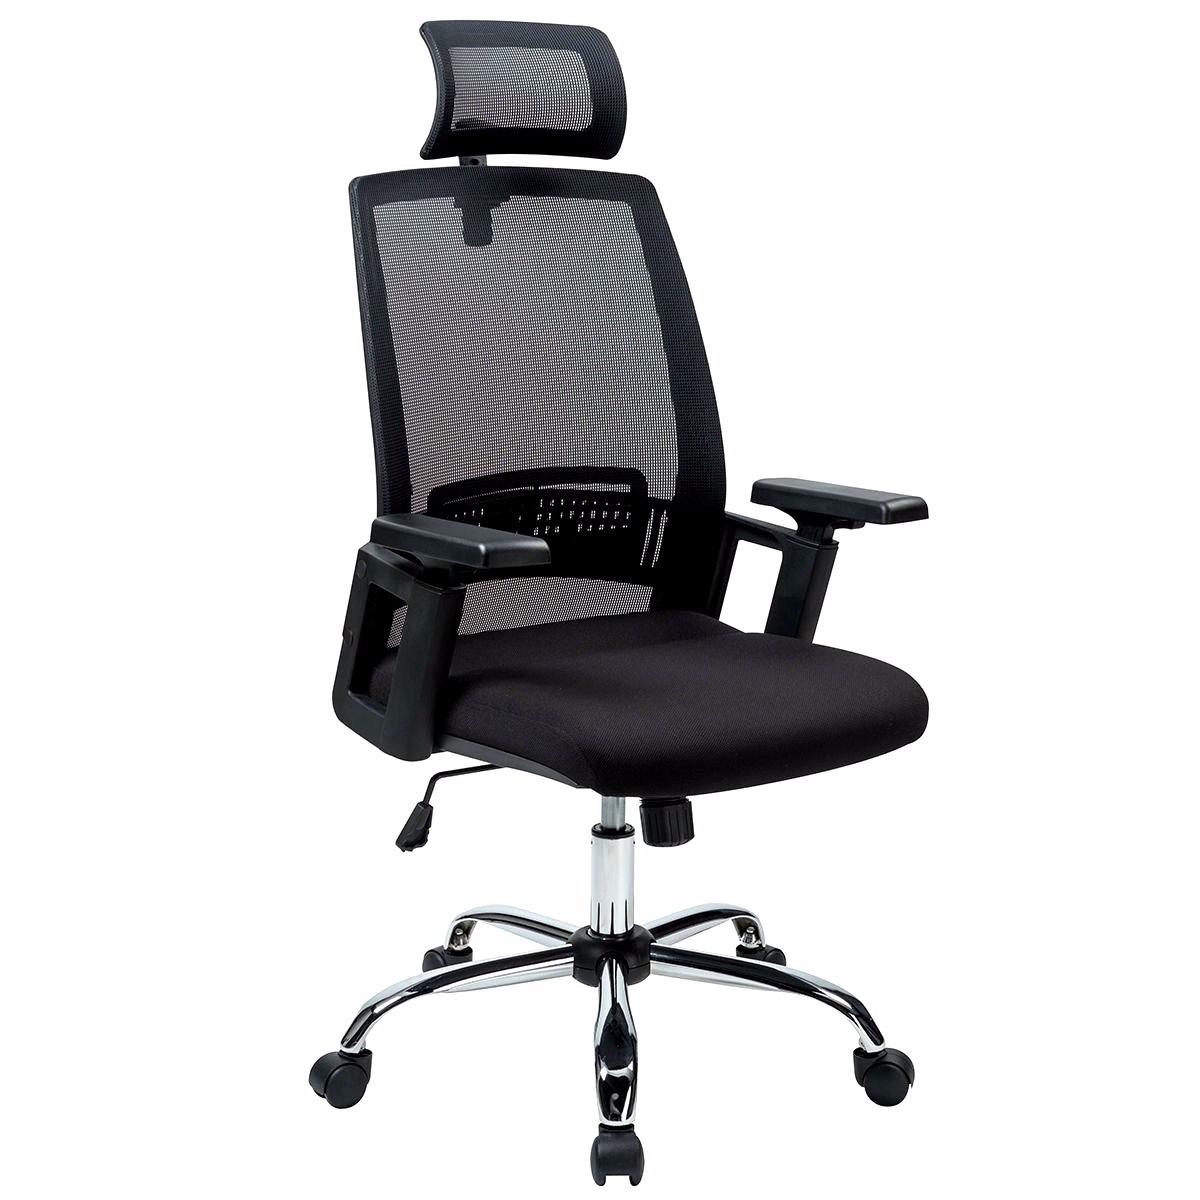 Silla ergonomica p oficina reclinable escritorio vp0026 for Sillas ergonomicas para oficina precio